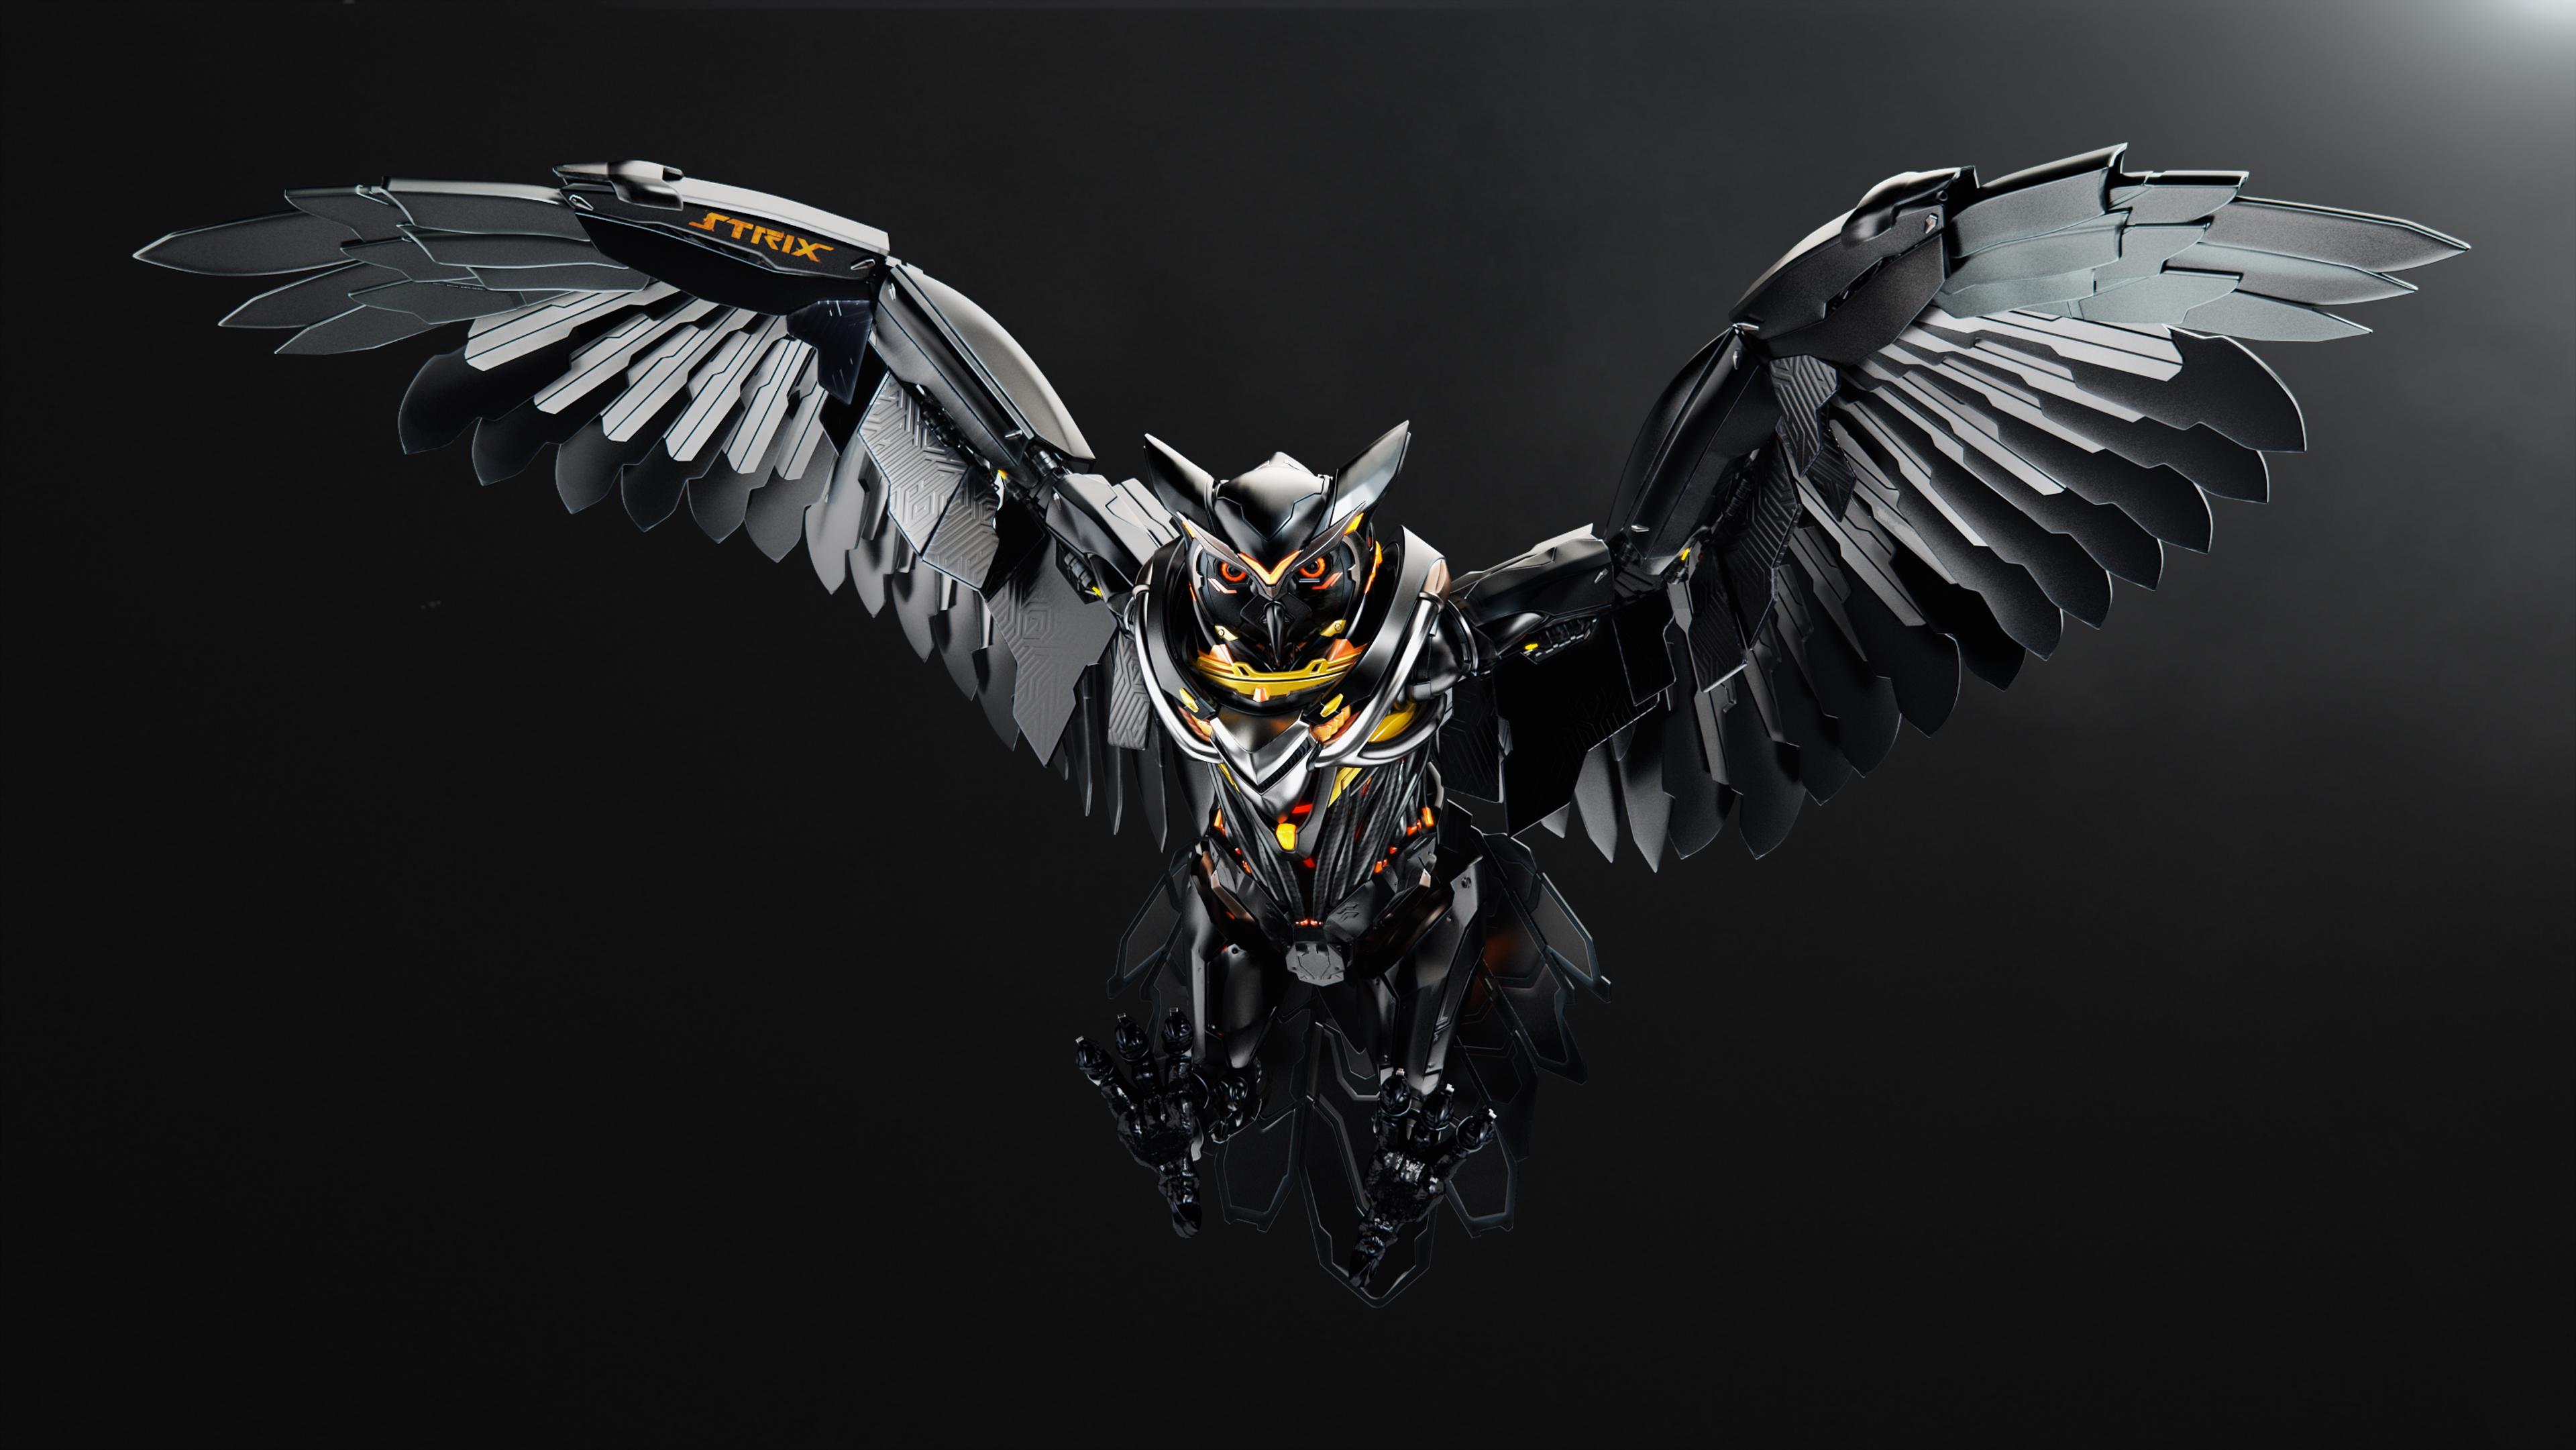 Strix-owl-image